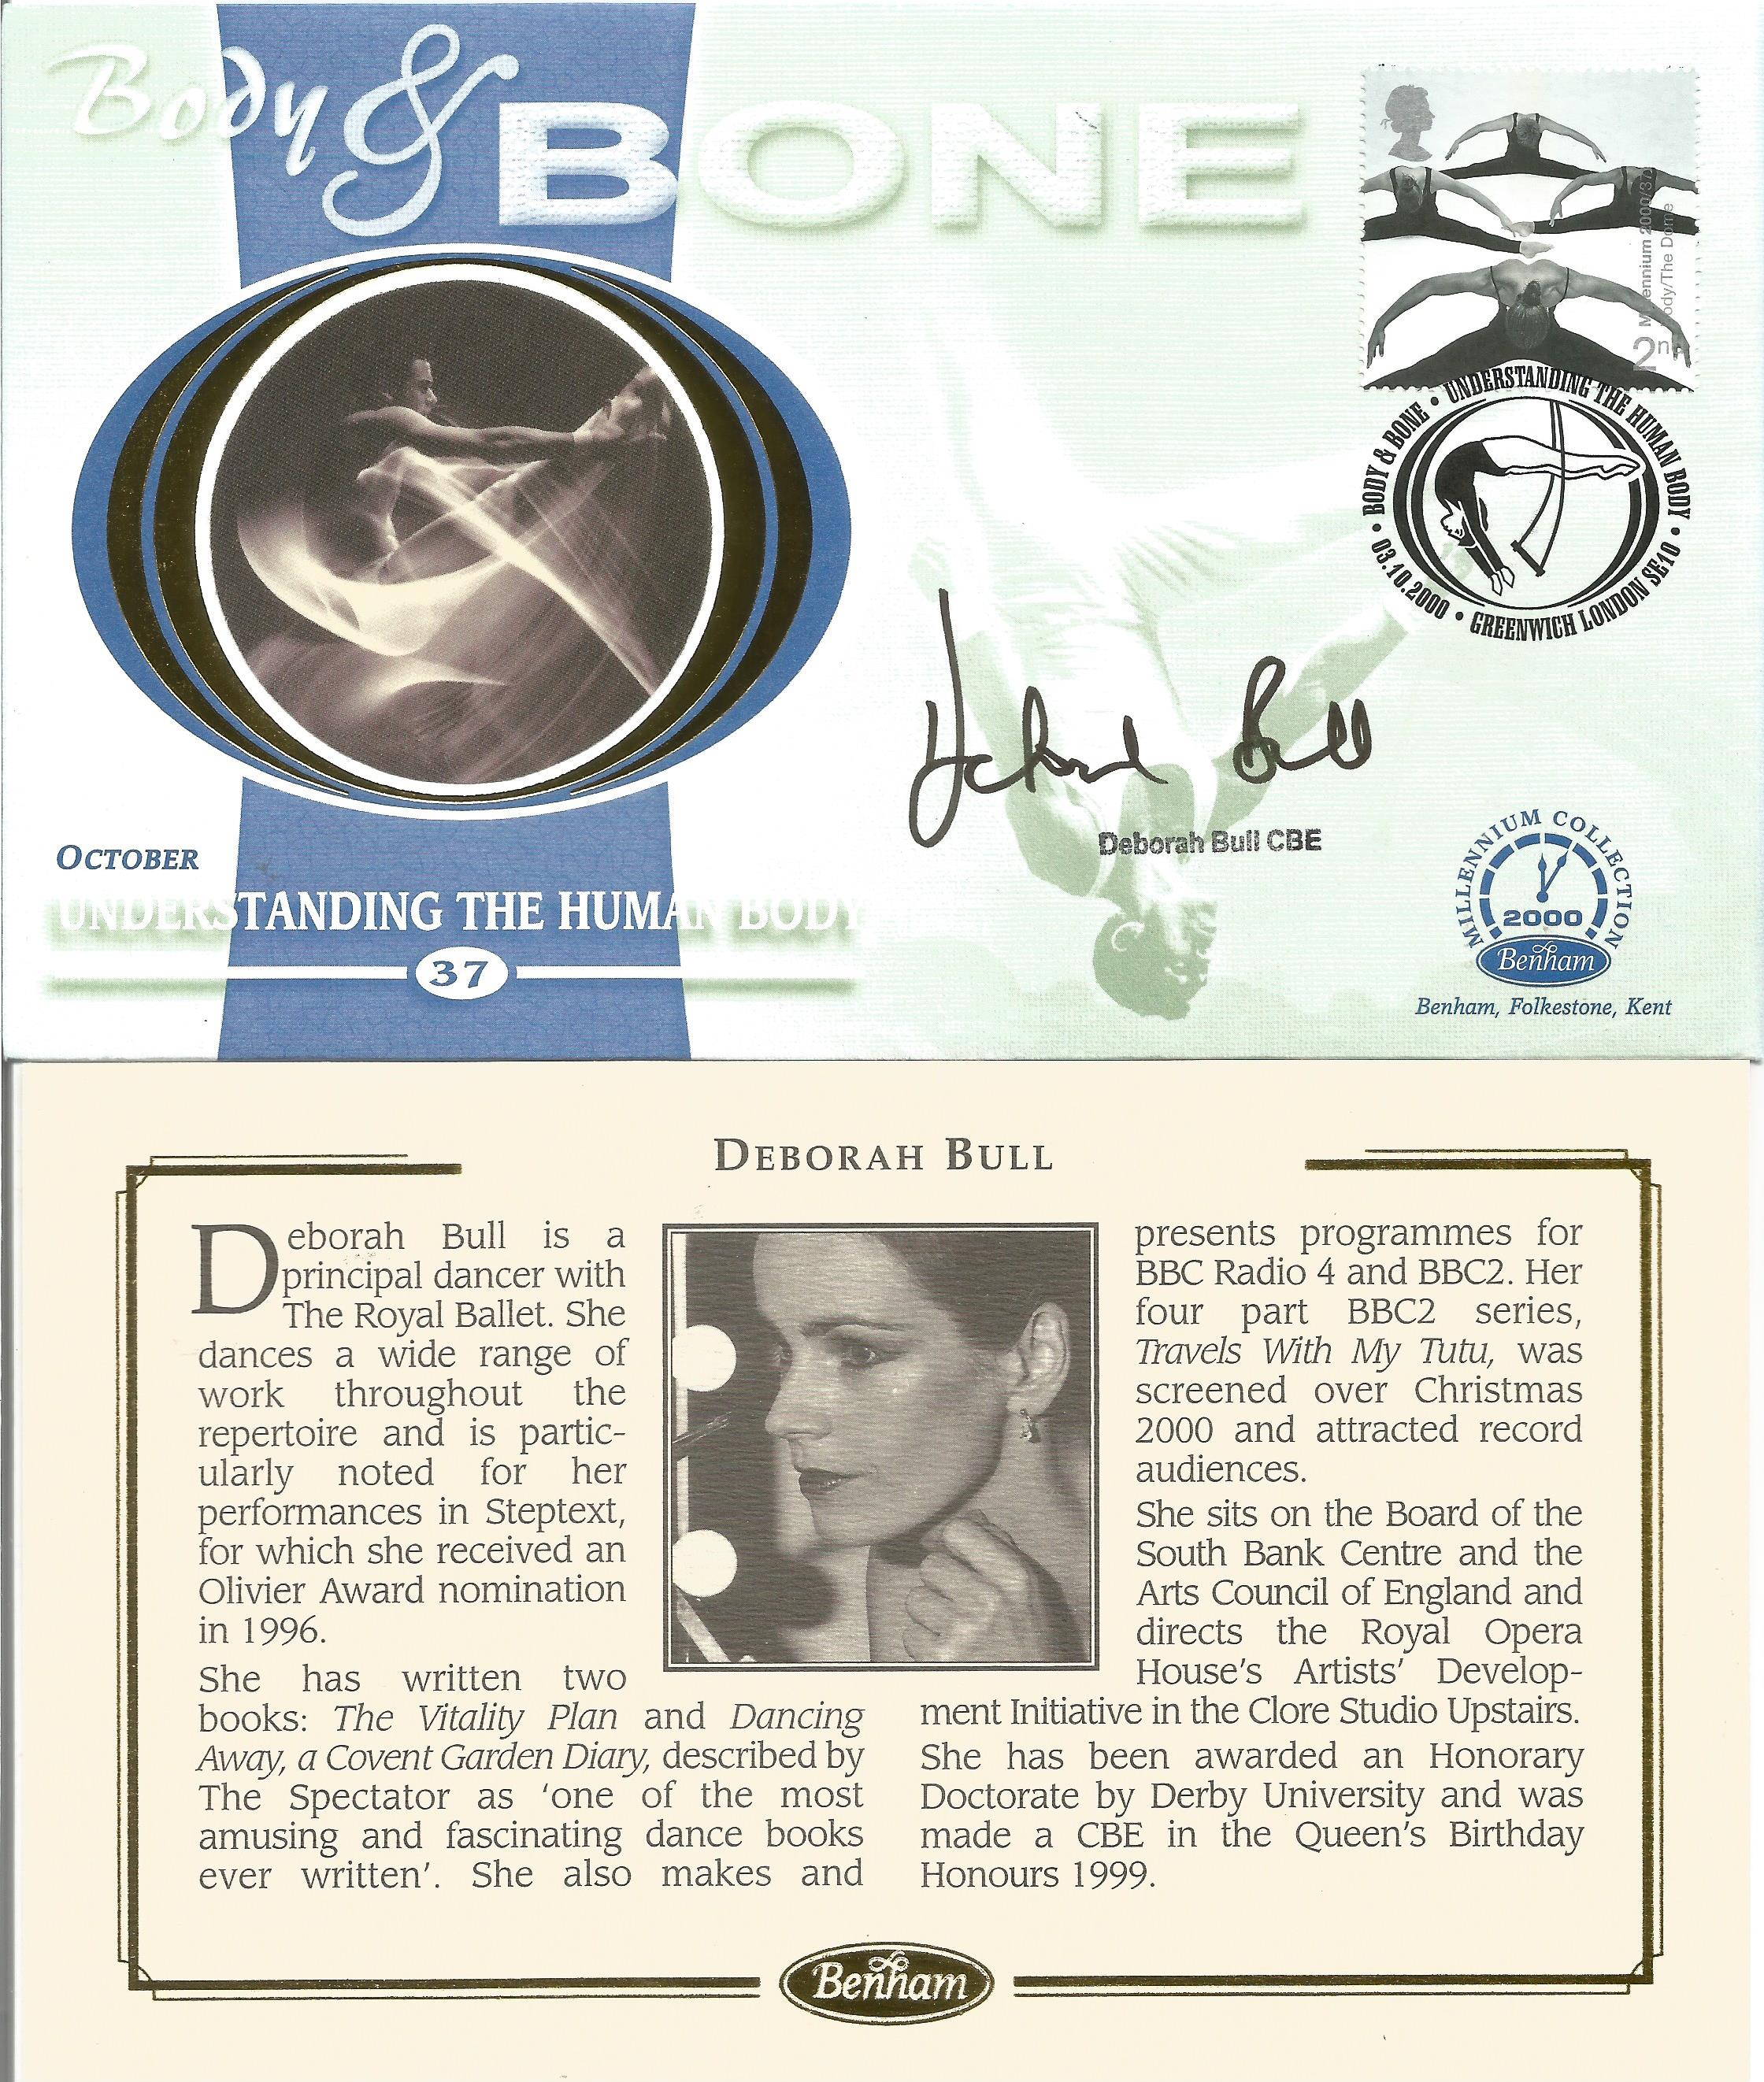 Deborah Bull CBE signed Body & Bone FDC. 3 10 2000 Greenwich postmark. Good condition. All